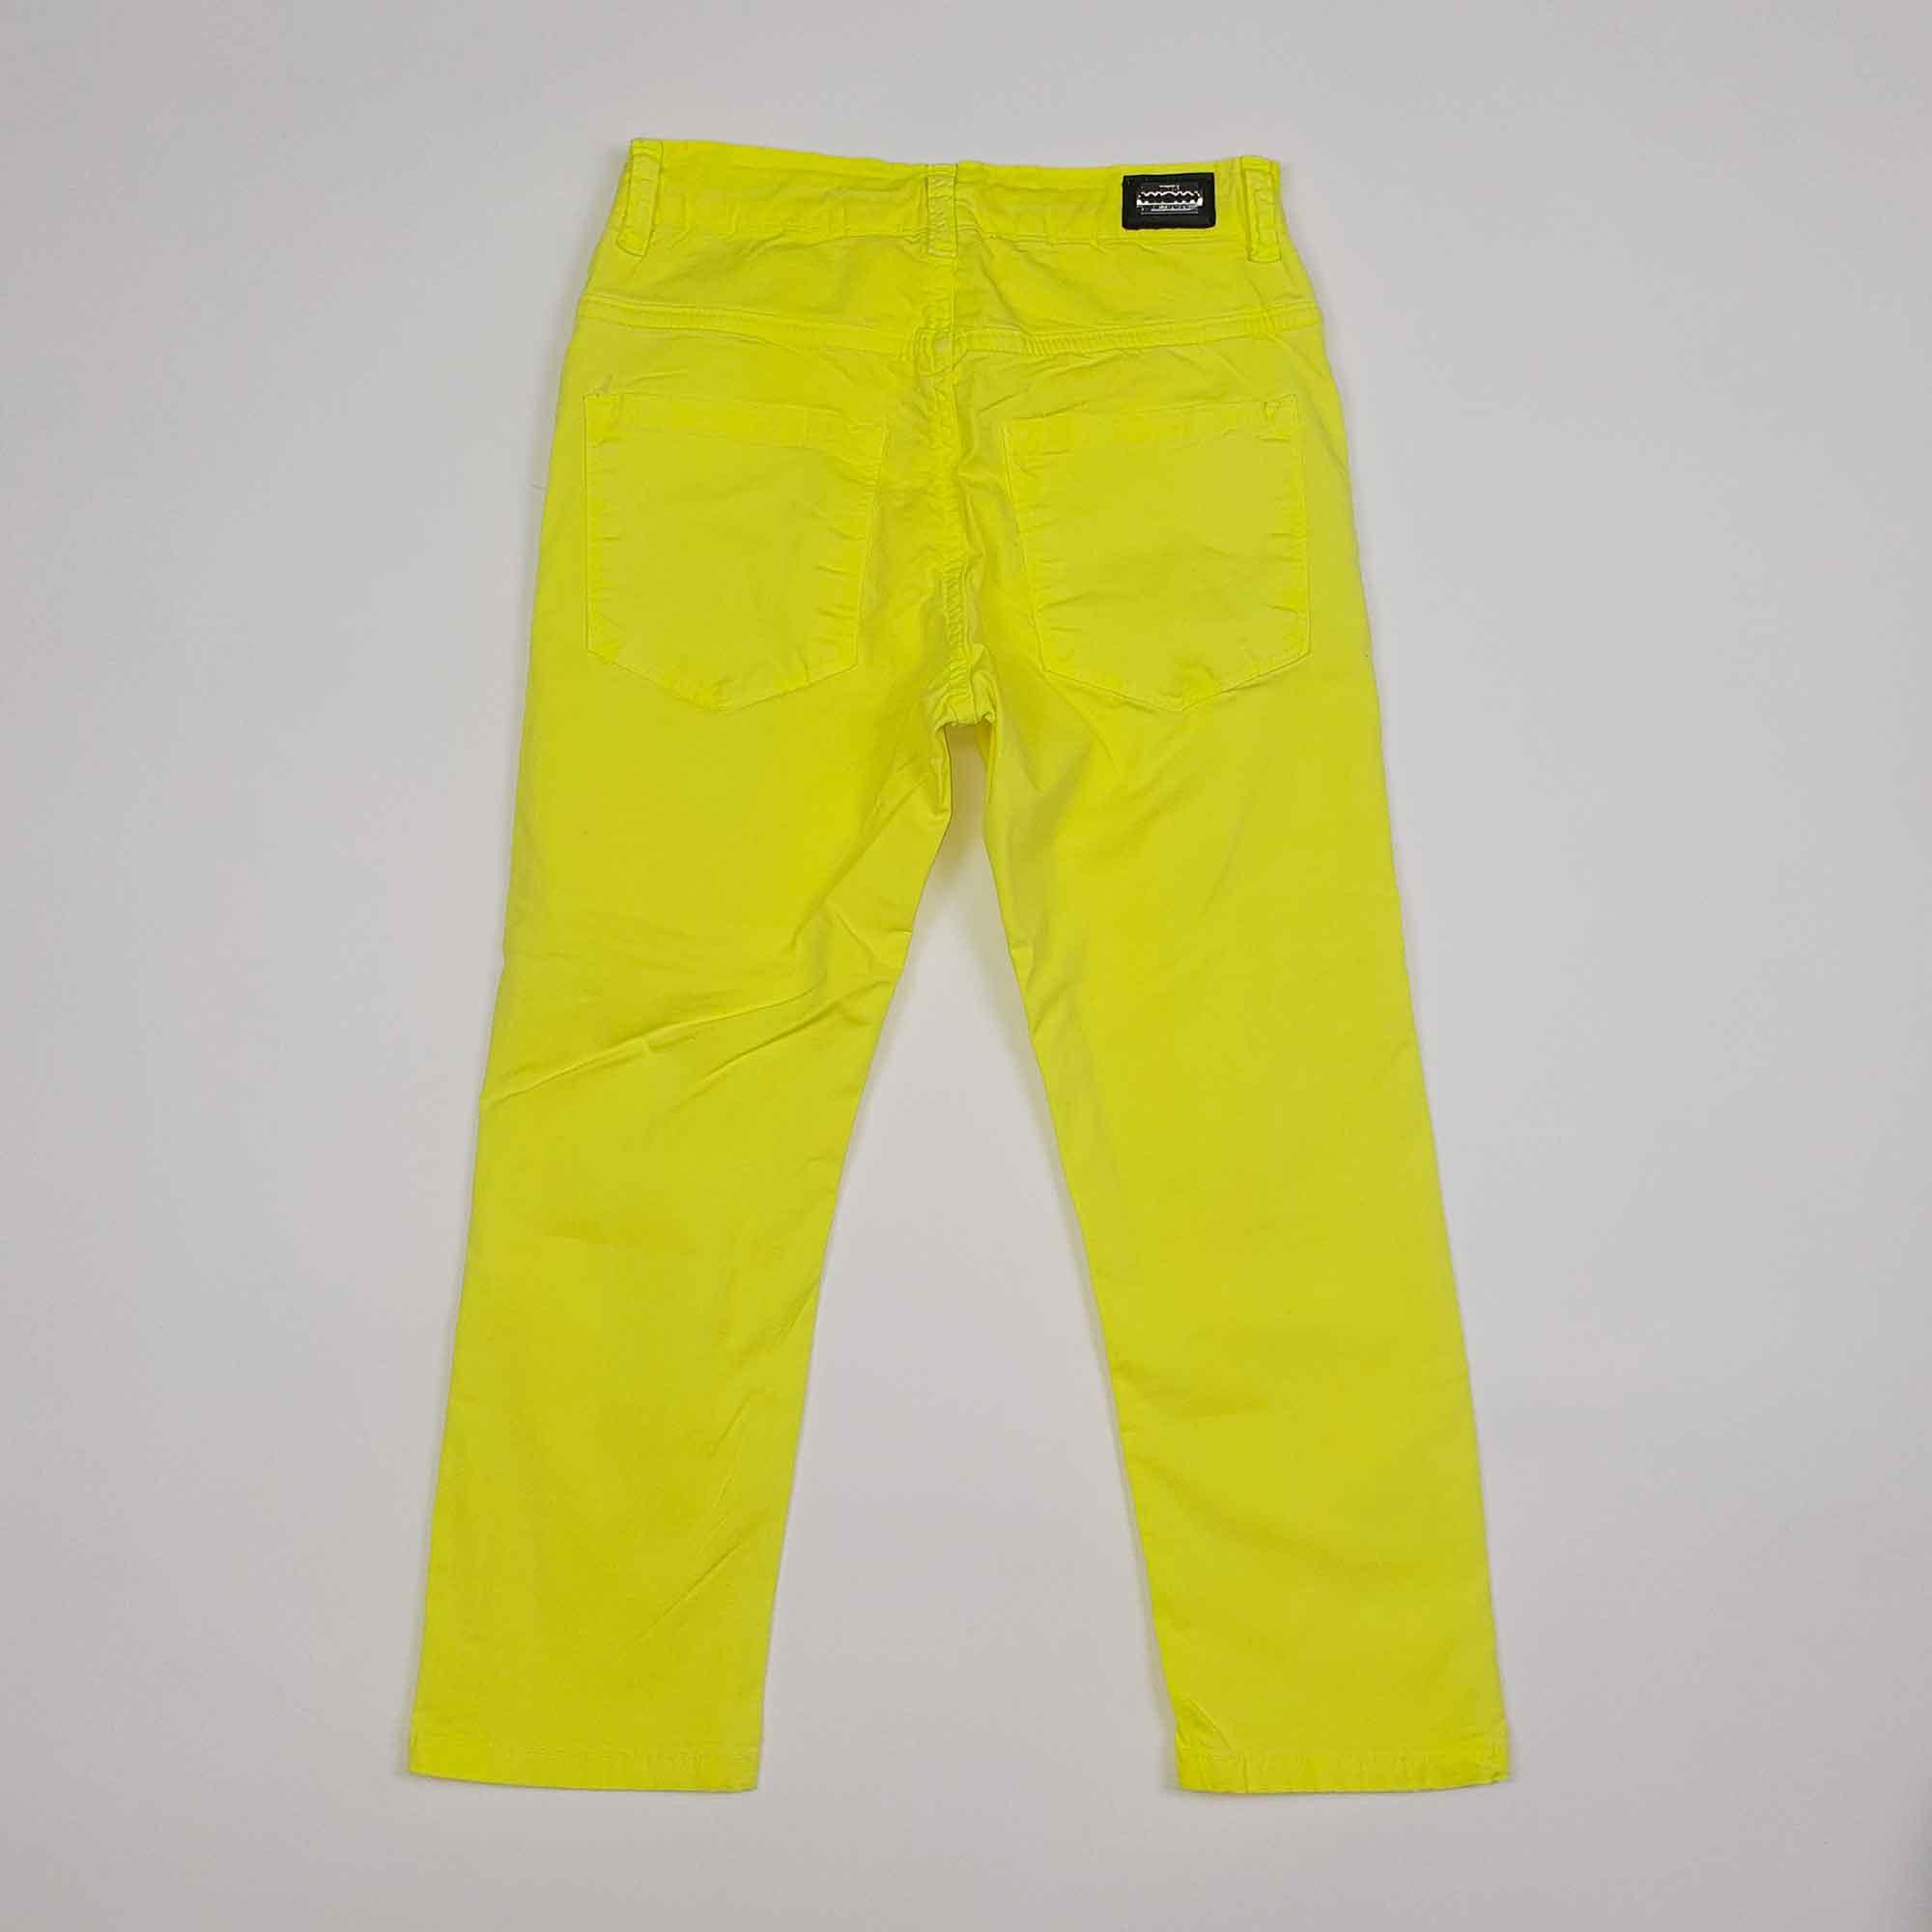 Pantalone rotture - Giallo fluo